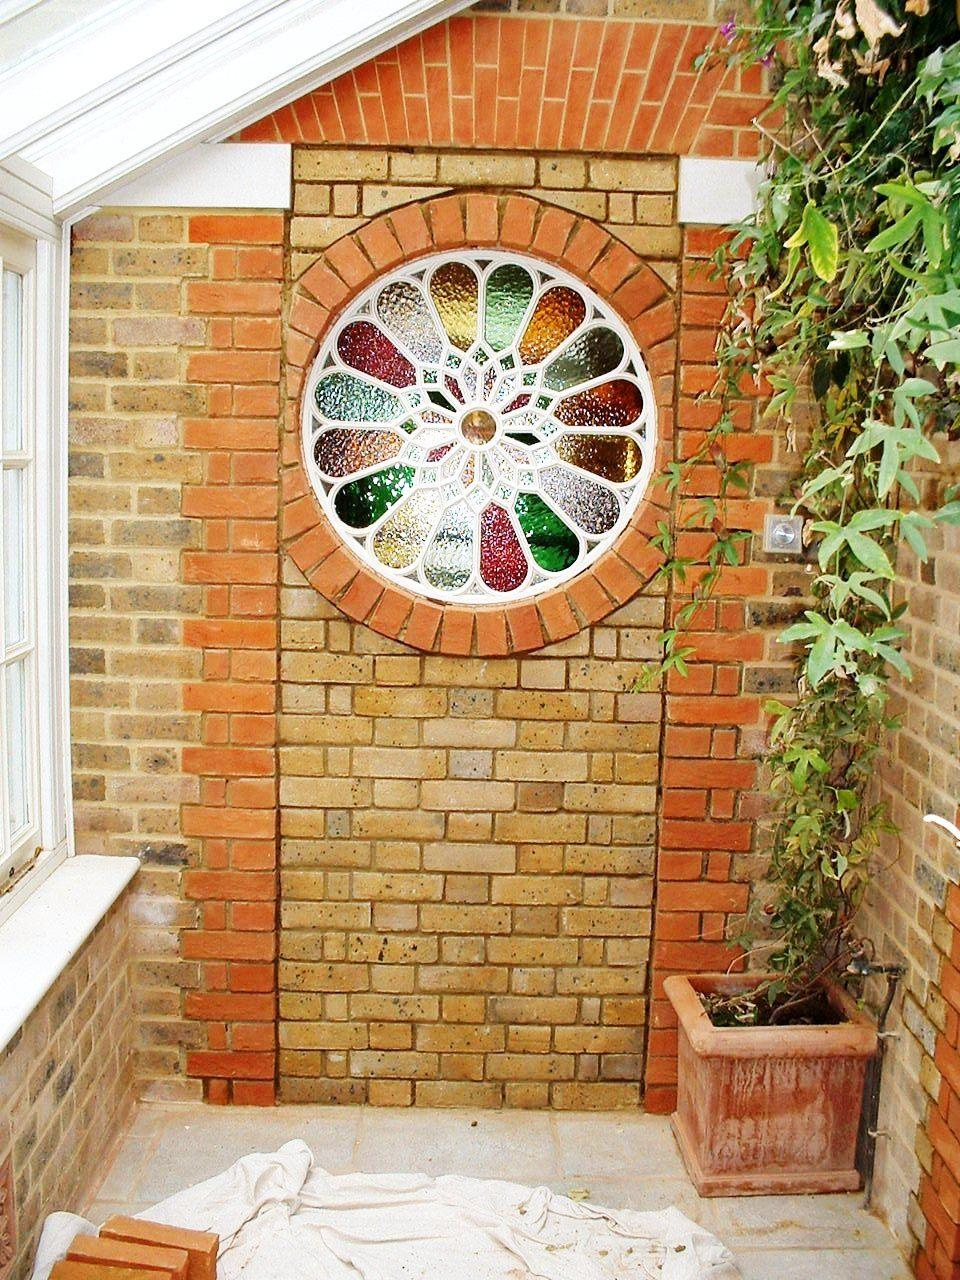 Landscaping in Kent - Window in Brickwork